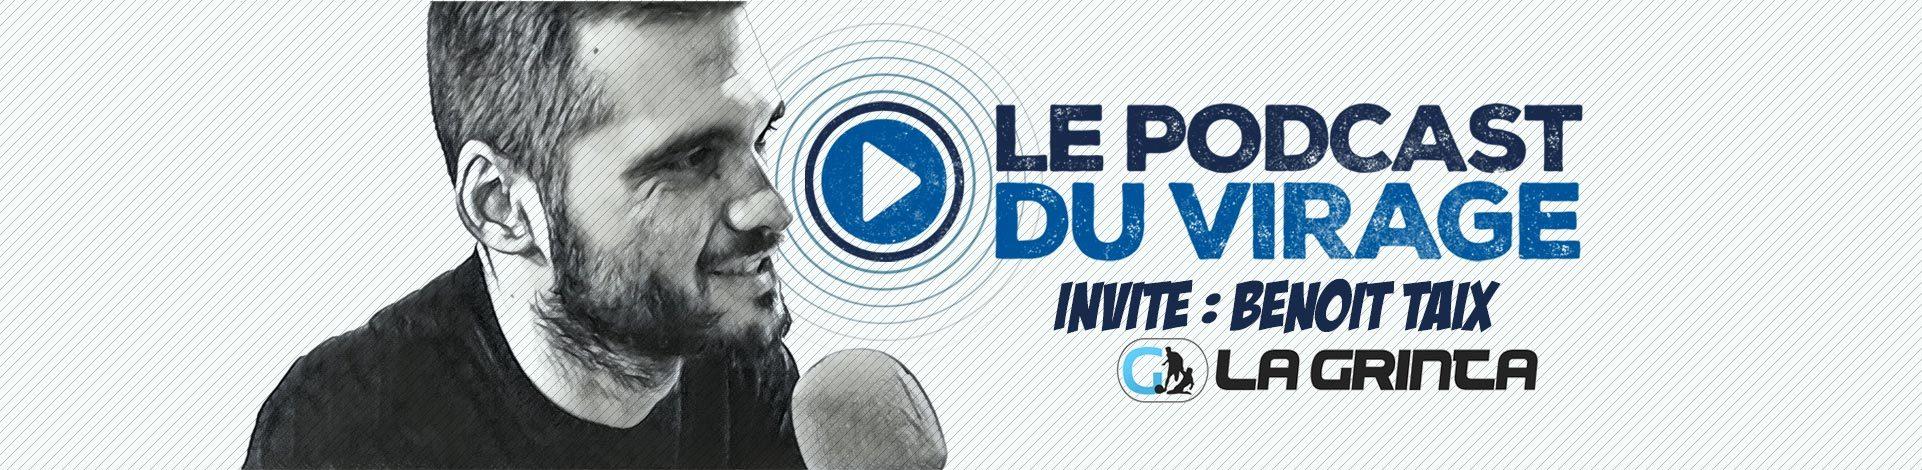 Benoit Taix Podcast Virage PSG